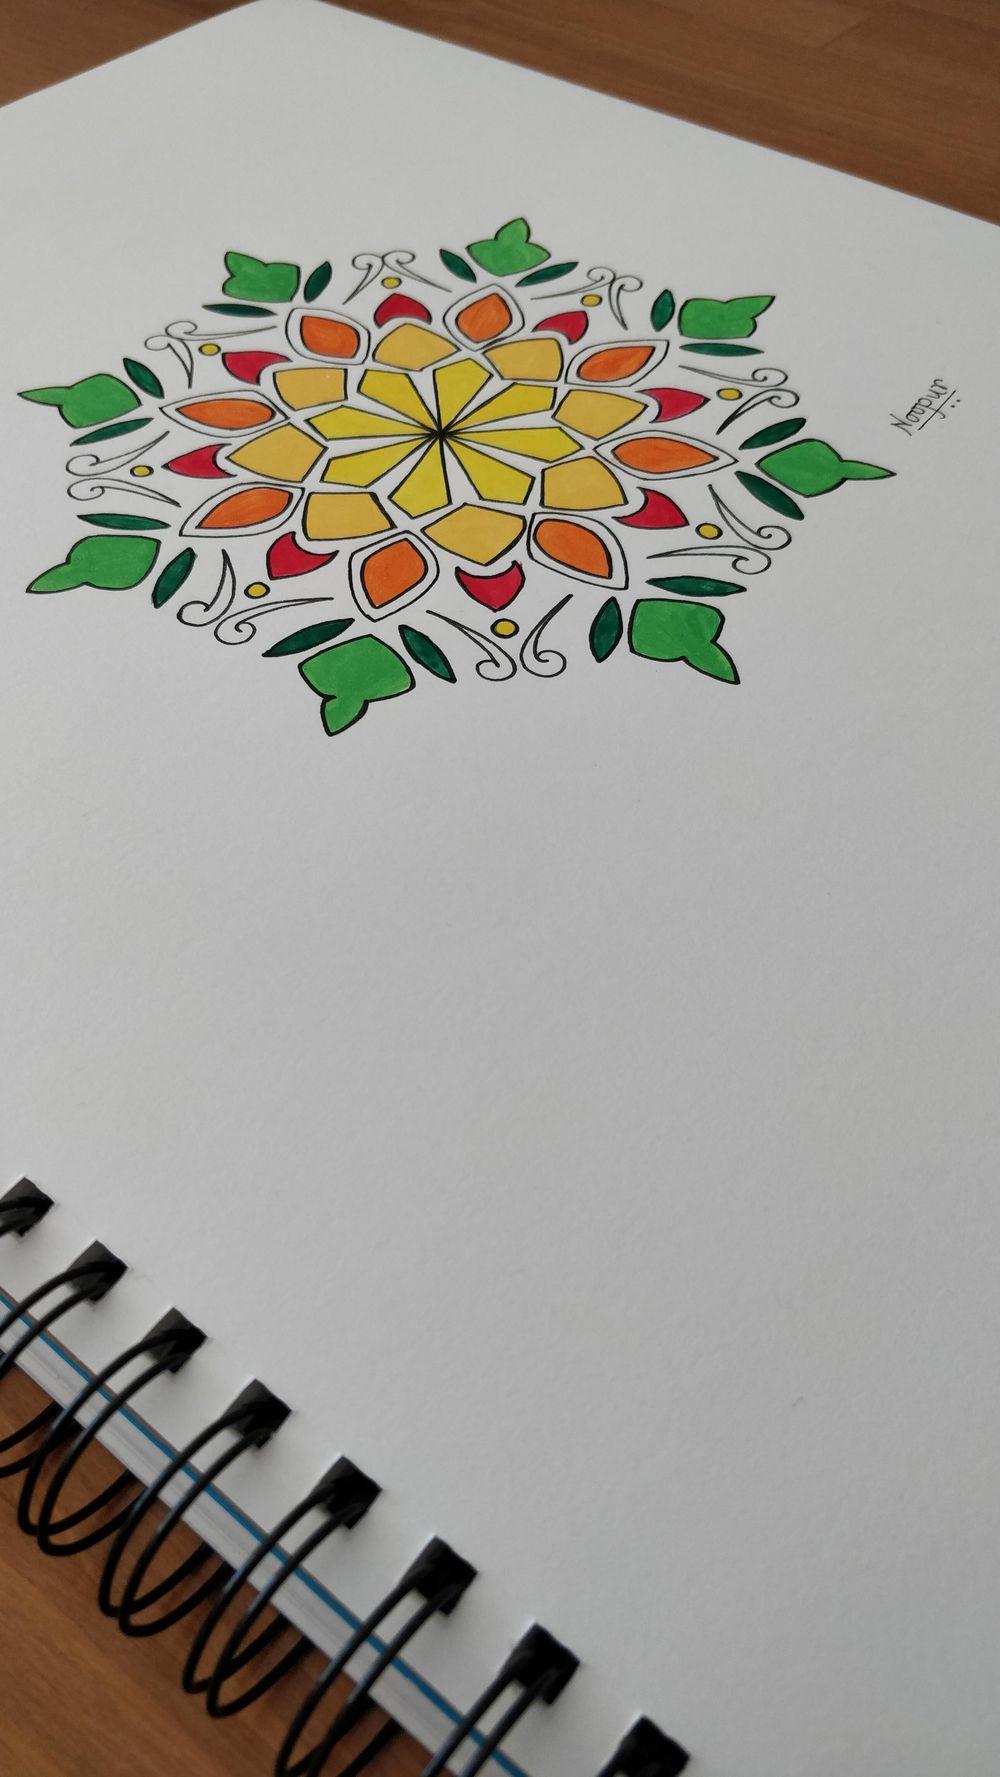 Motif Mandala - image 1 - student project